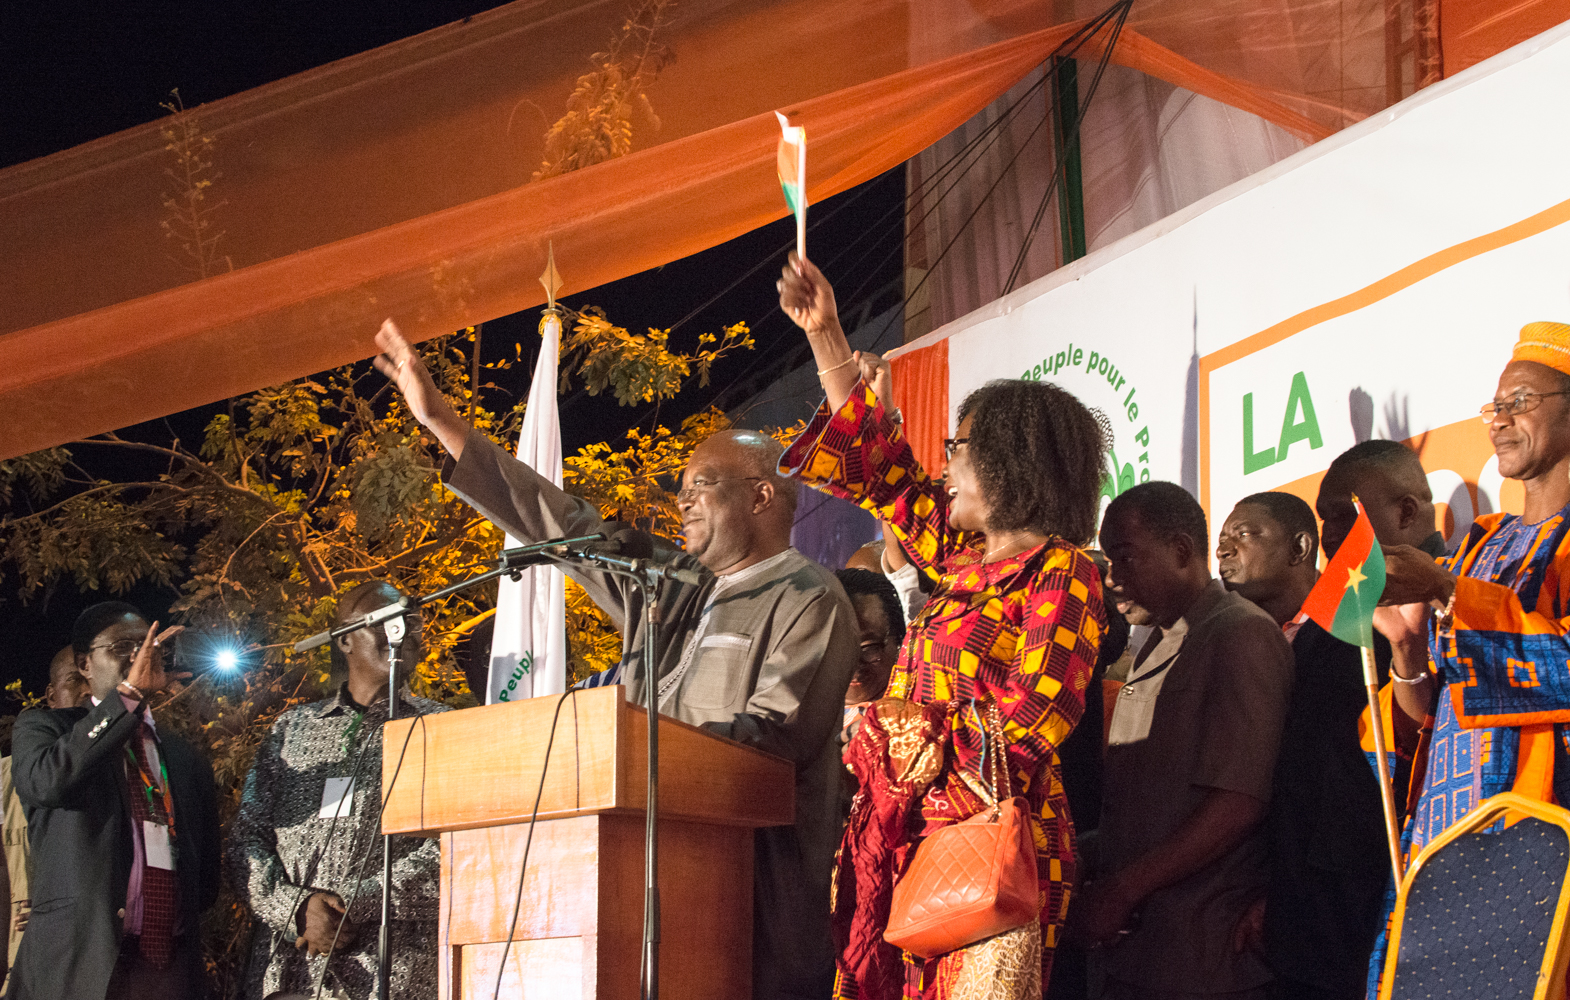 burkina_faso_resultats_elections_presidentielle_2015_roch_kabore